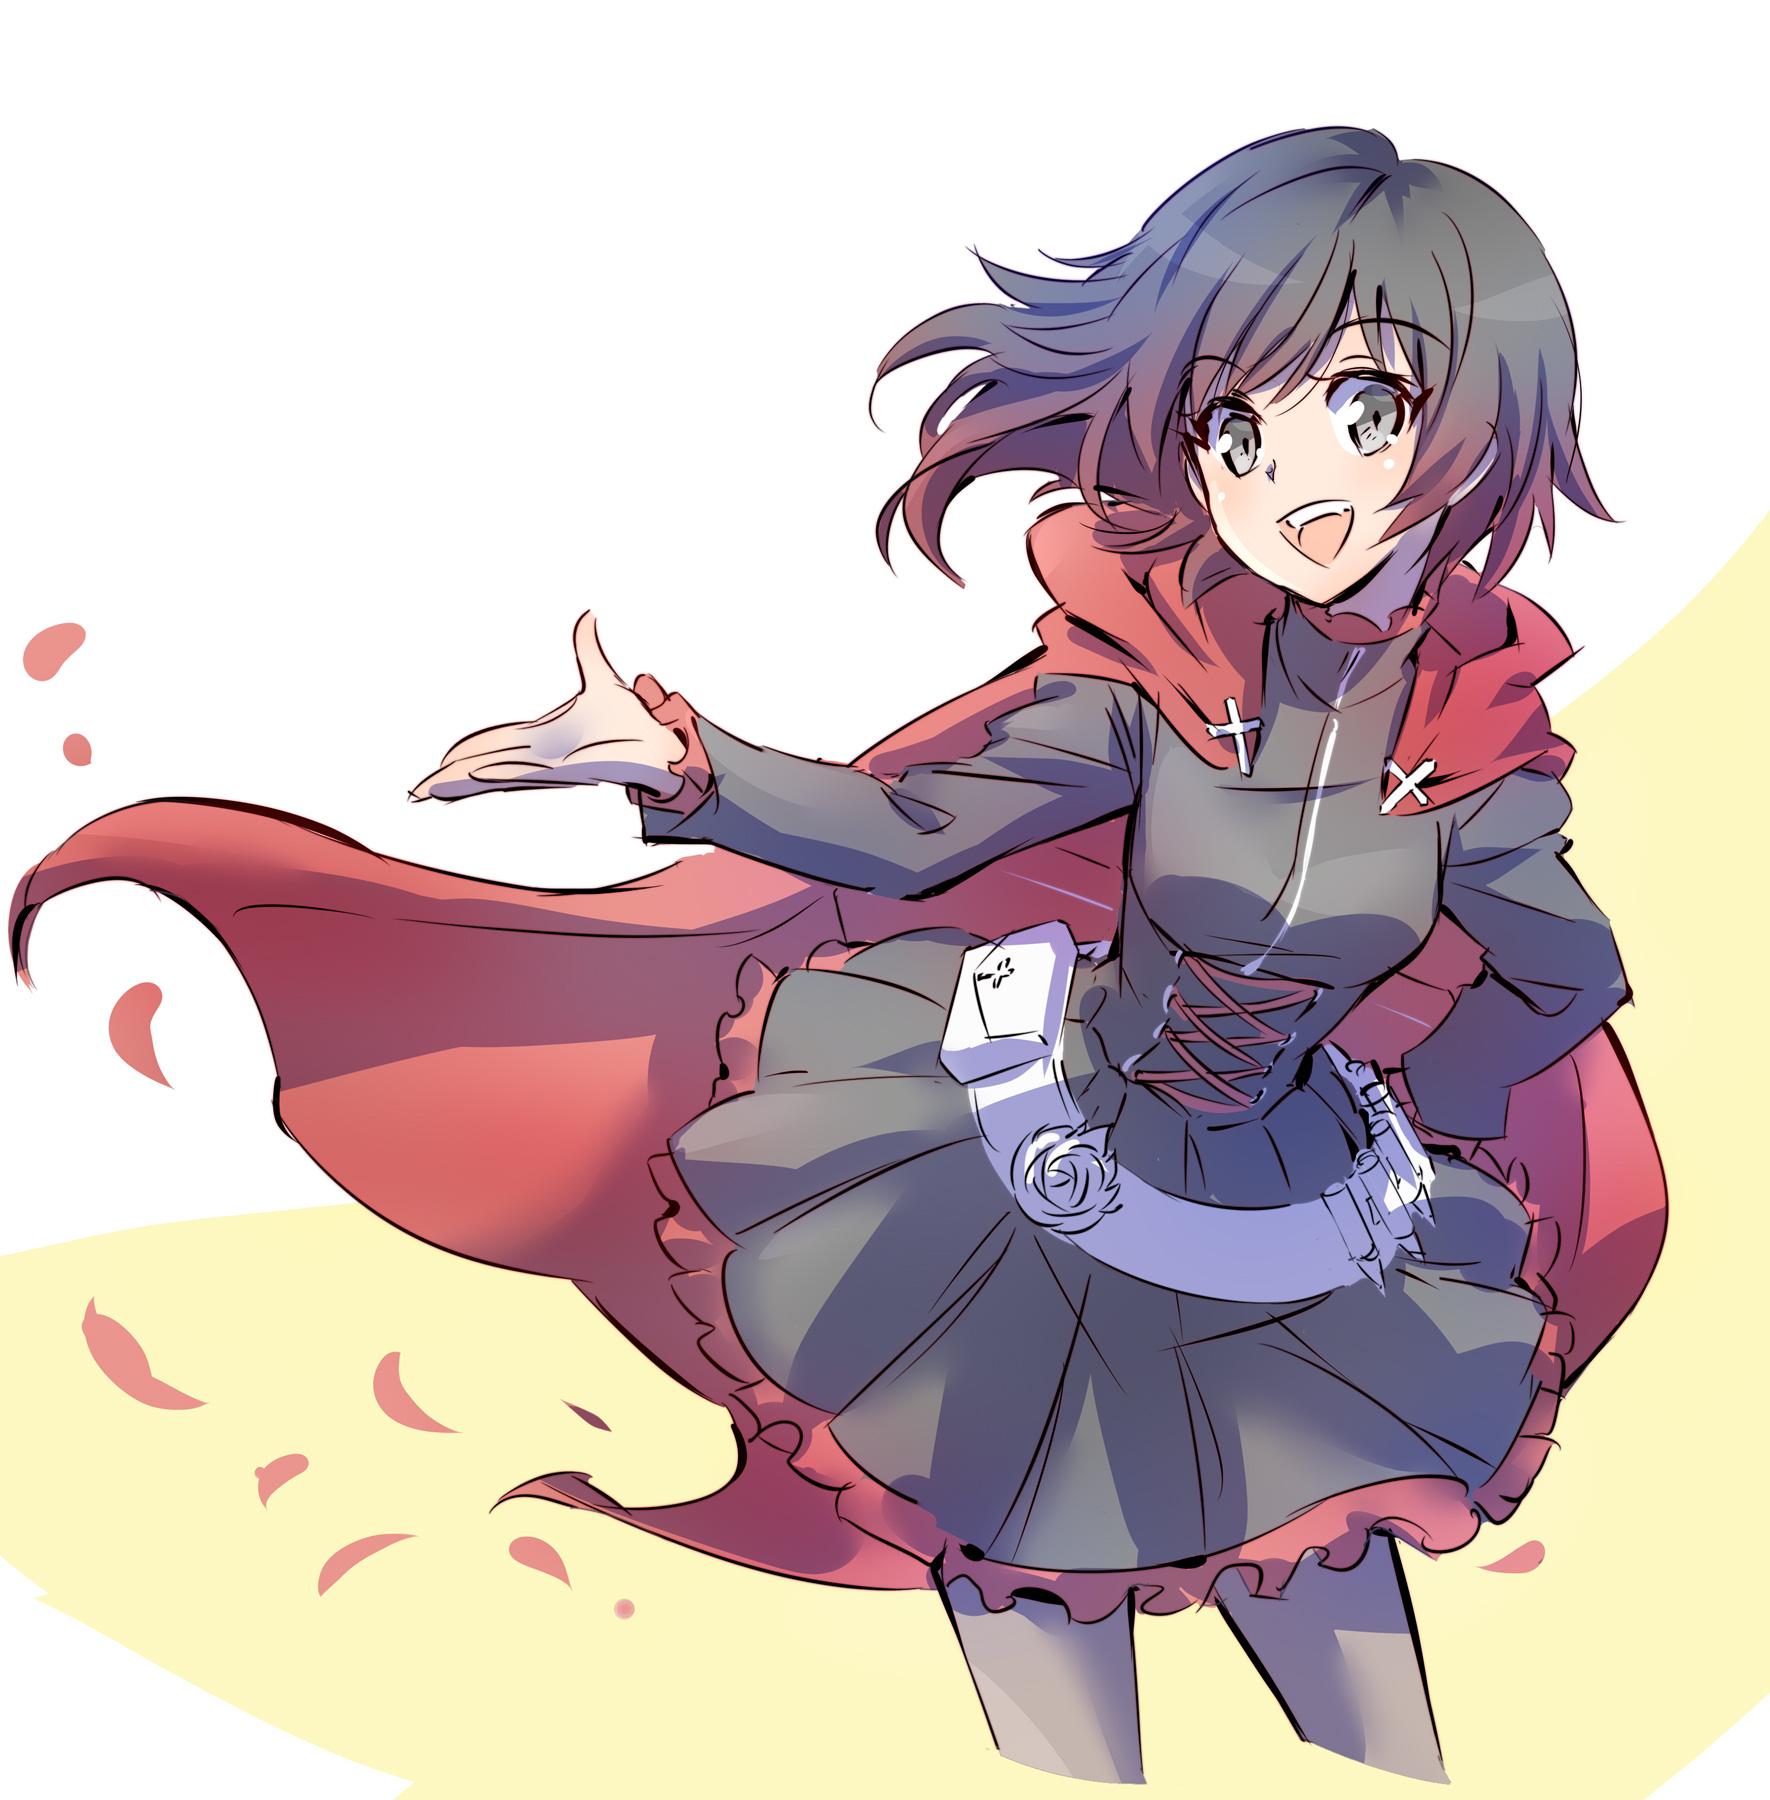 Ruby rose rwby image 2179052 zerochan anime image board - Rwby ruby rose fanart ...